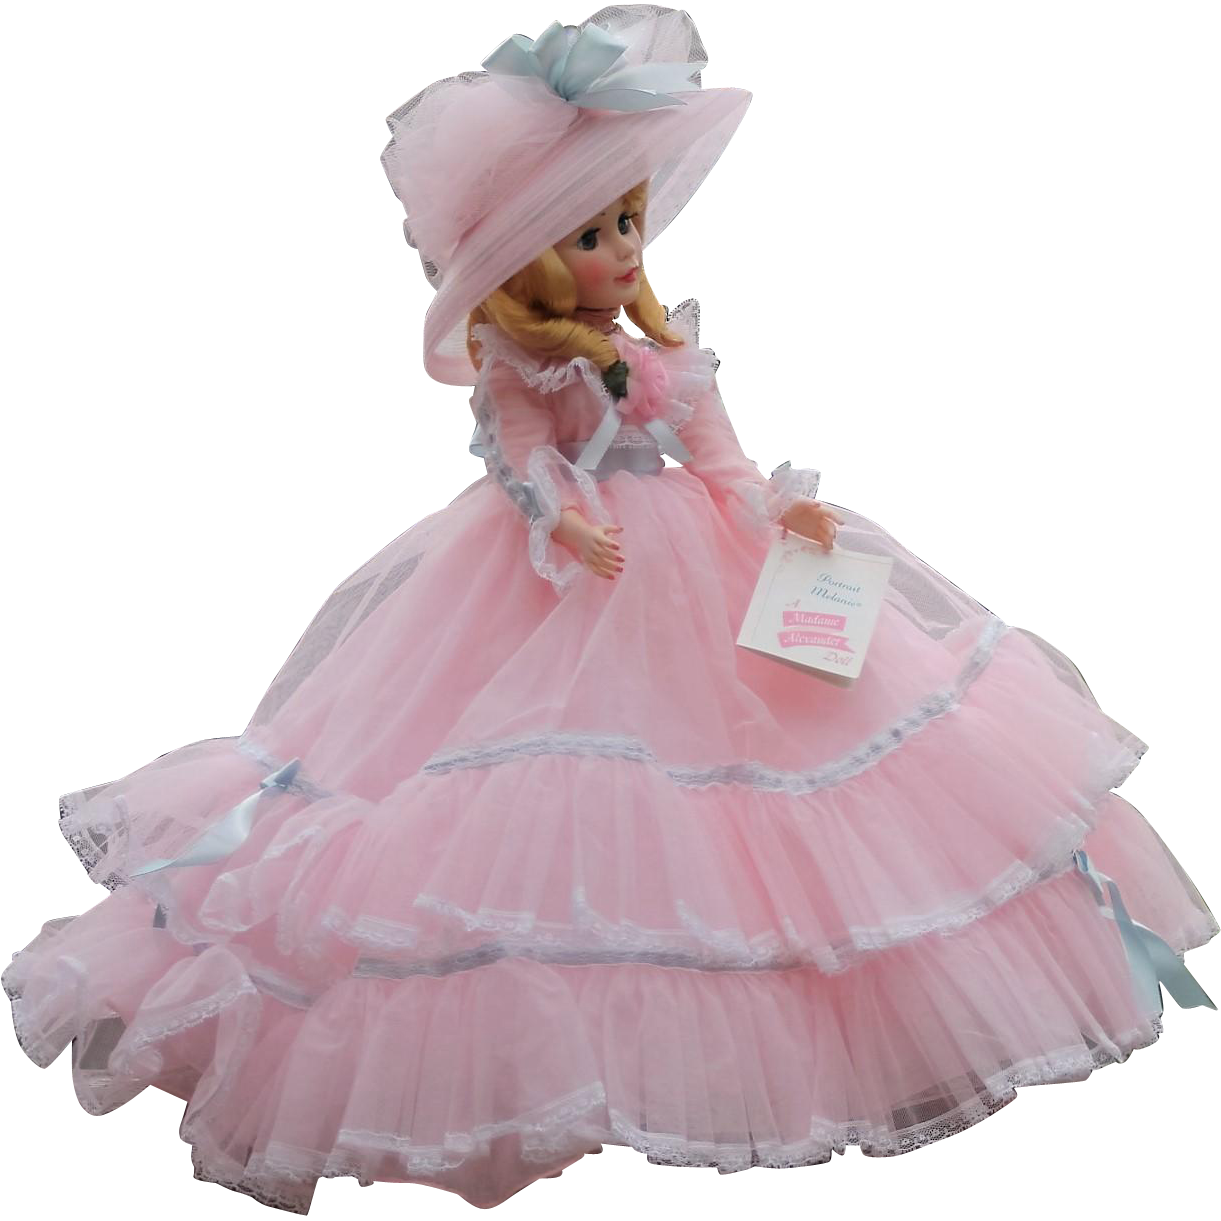 Vintage Madame Alexander Melanie Portrait Doll - MIB!!